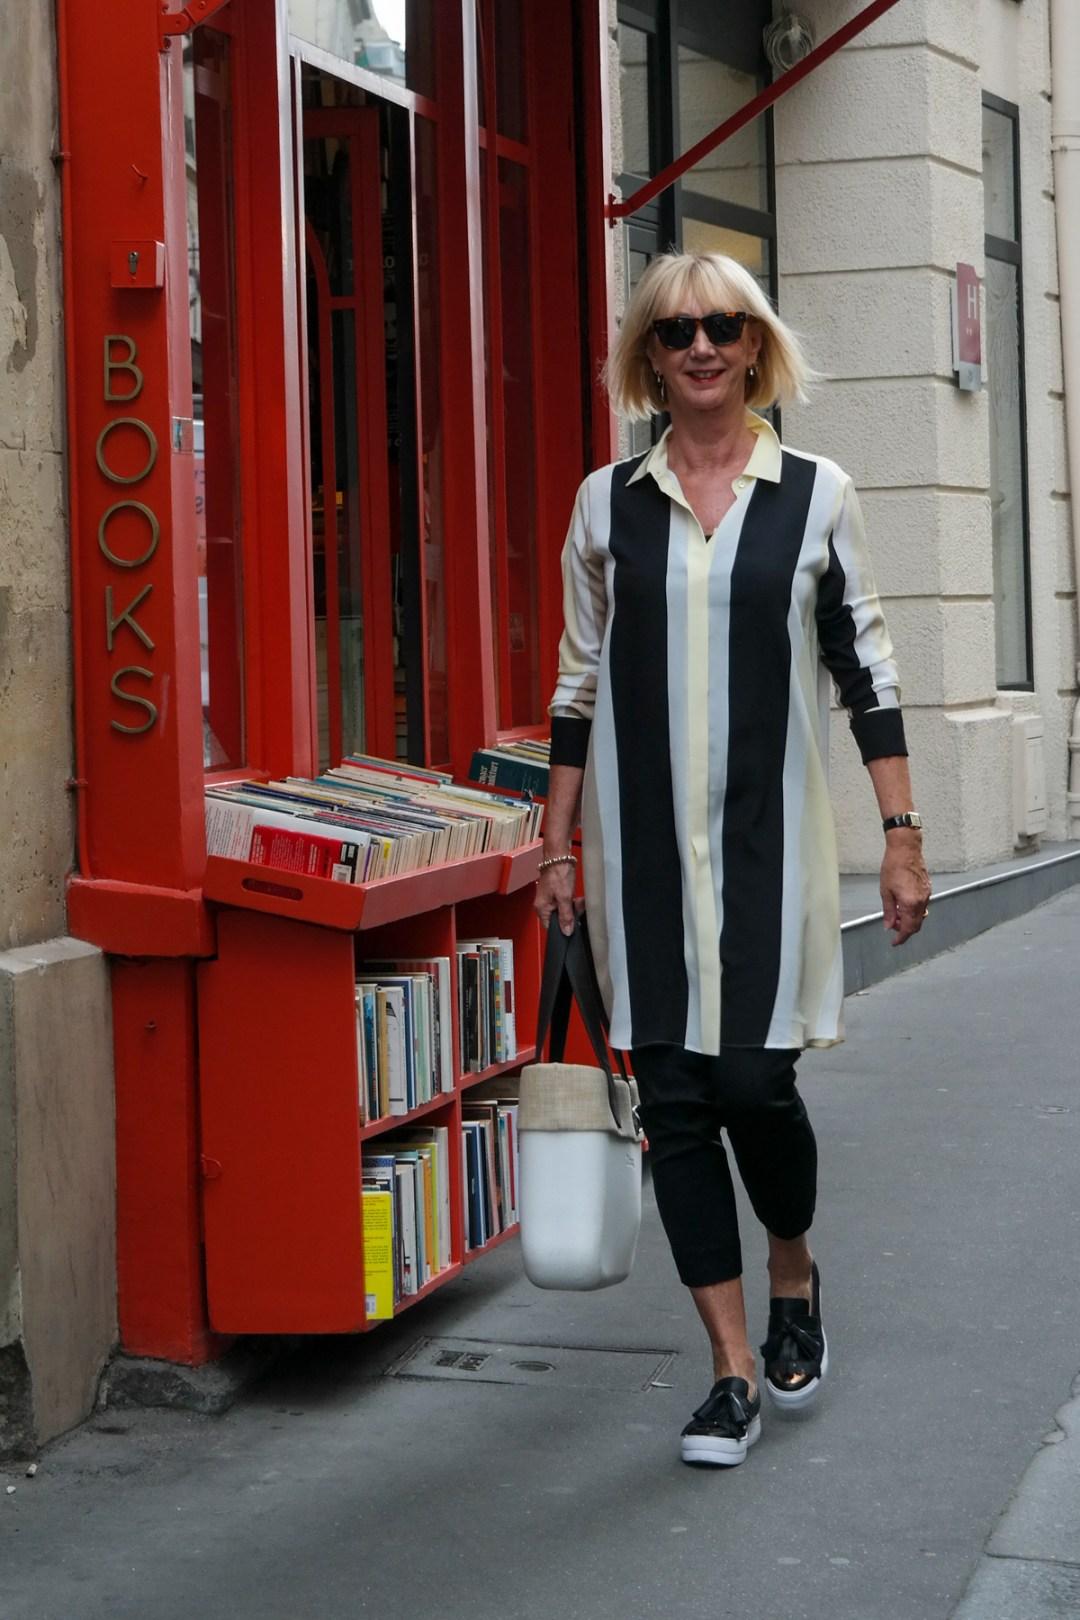 glamupyourlifestyle bloggerinterview no-fear-of-fashion ü40-blog ue50-mode ue-40-bloggerin mode fashio